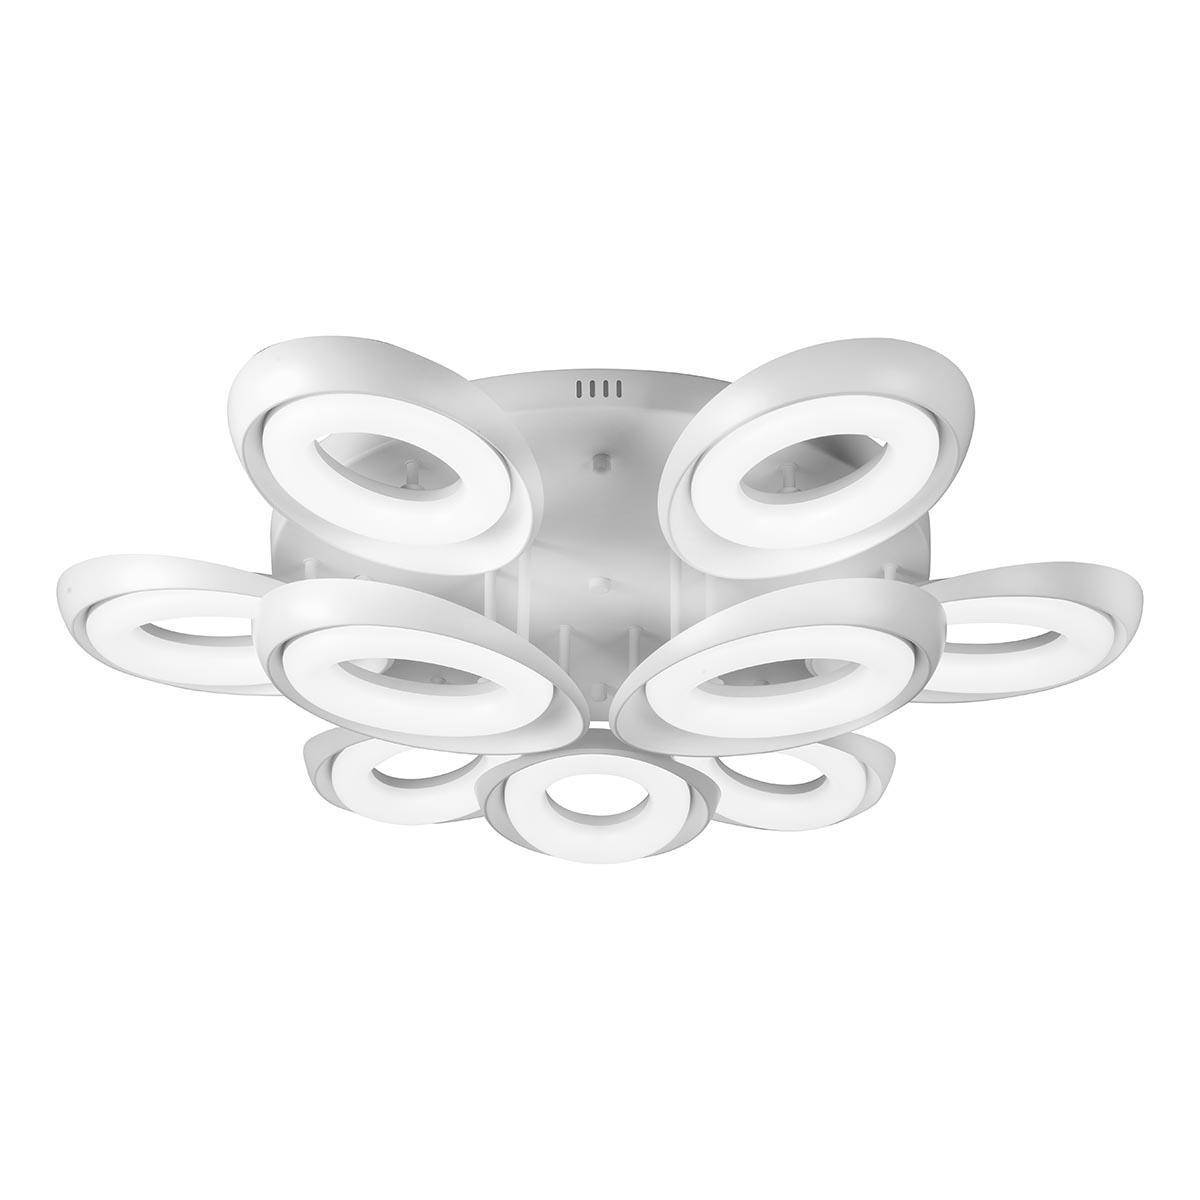 Потолочная светодиодная люстра iLedex Fancy FS-011-X9 216W WH